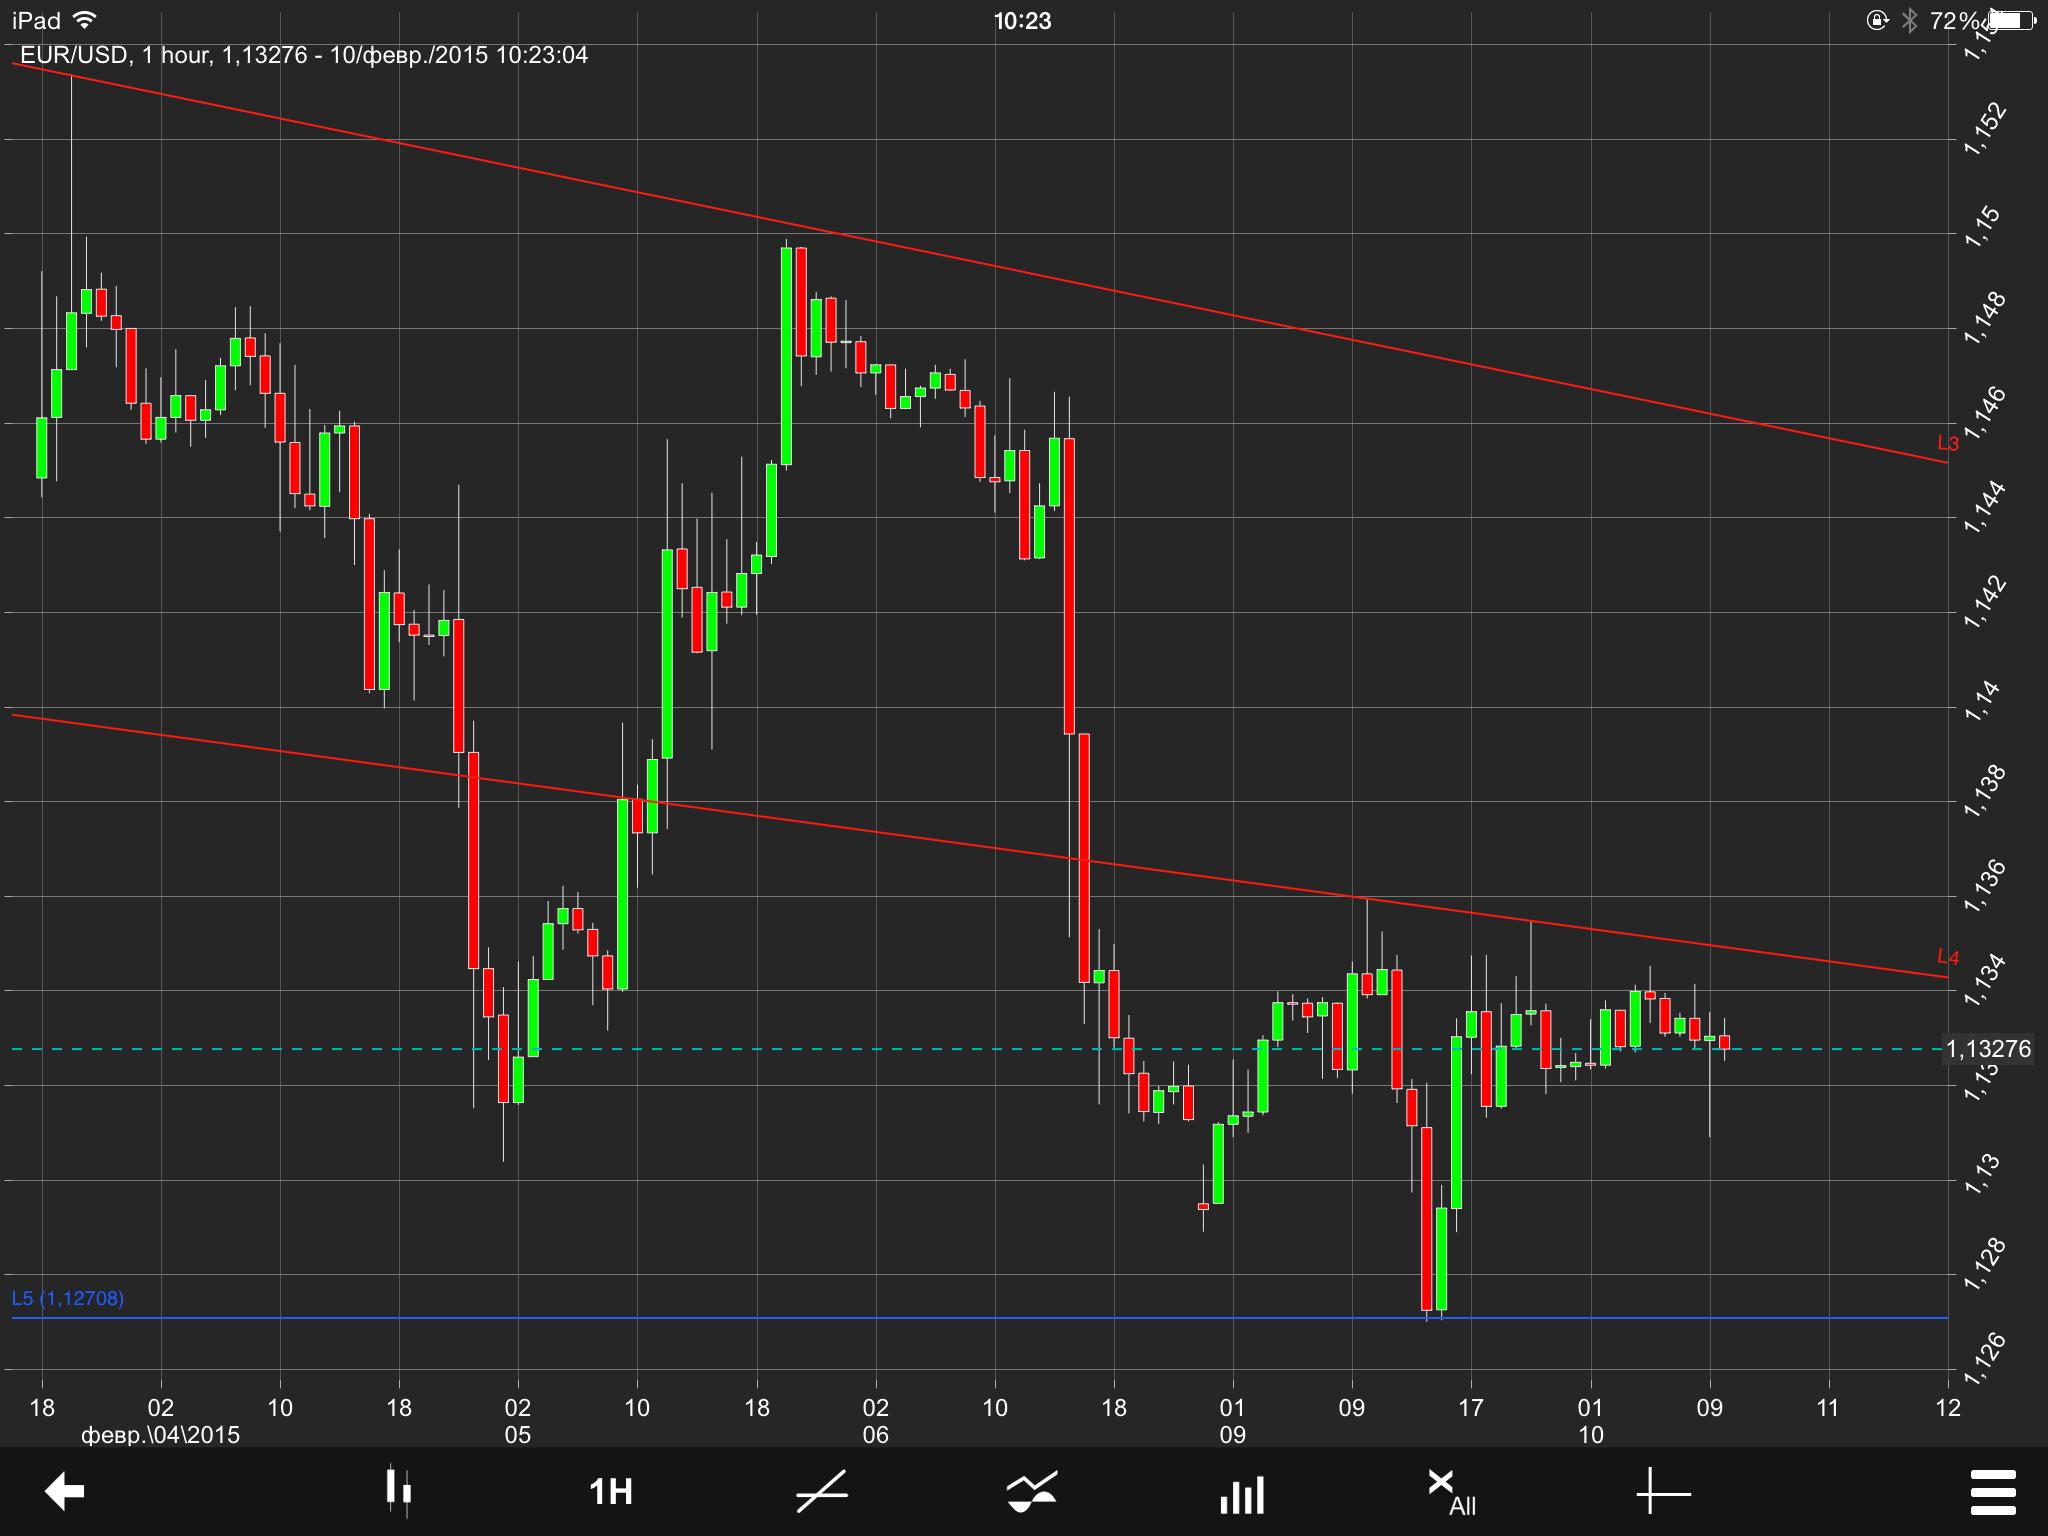 EUR/USD Chart 10 Feb 2015